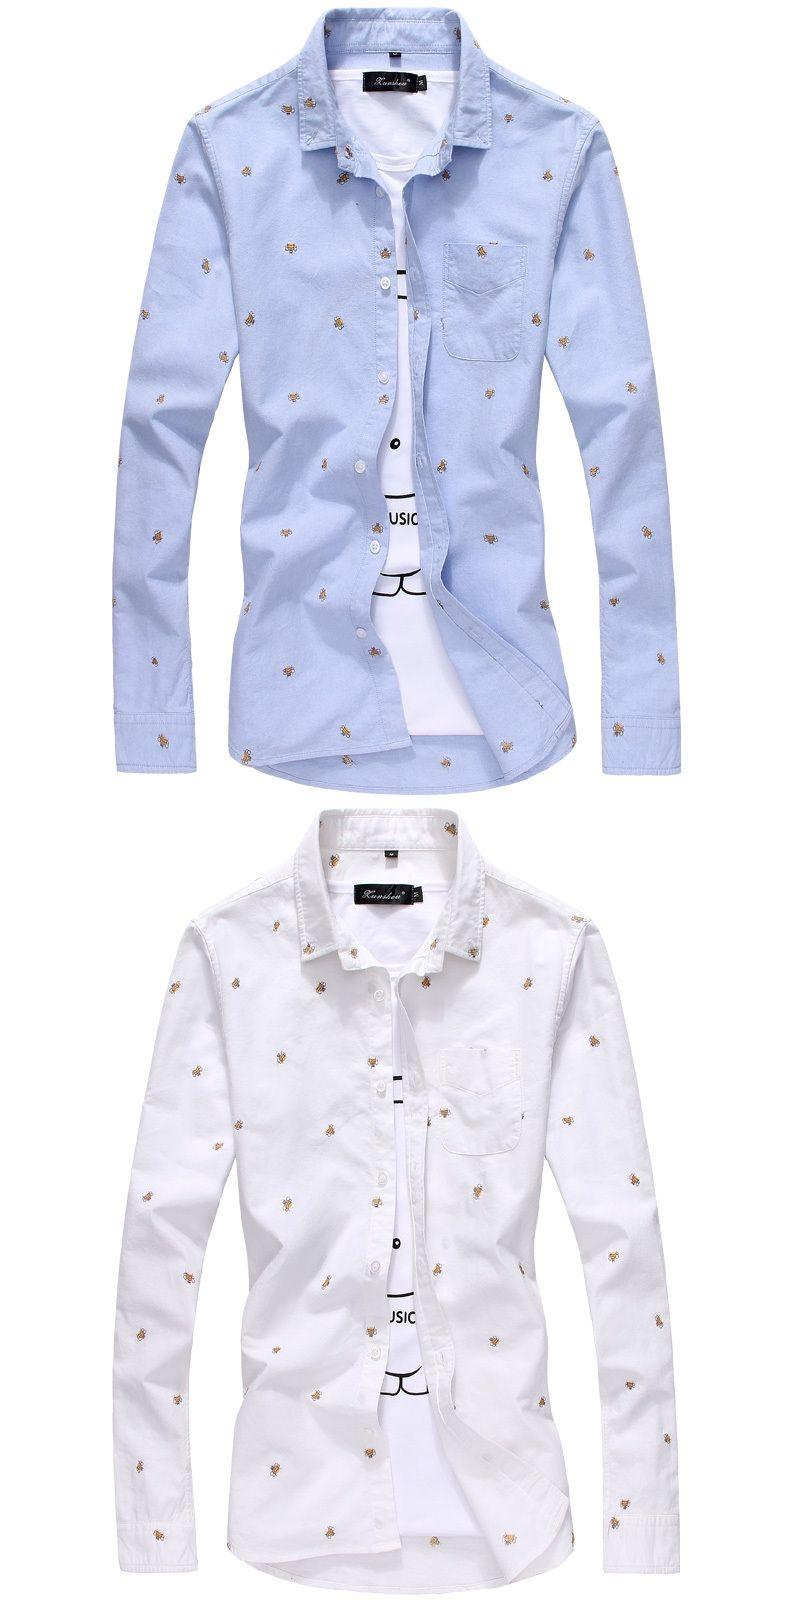 9acd8771715 korean style printed men dress shirts long sleeve casual cotton Slim  Stylish shirts Polka Dot Shirts